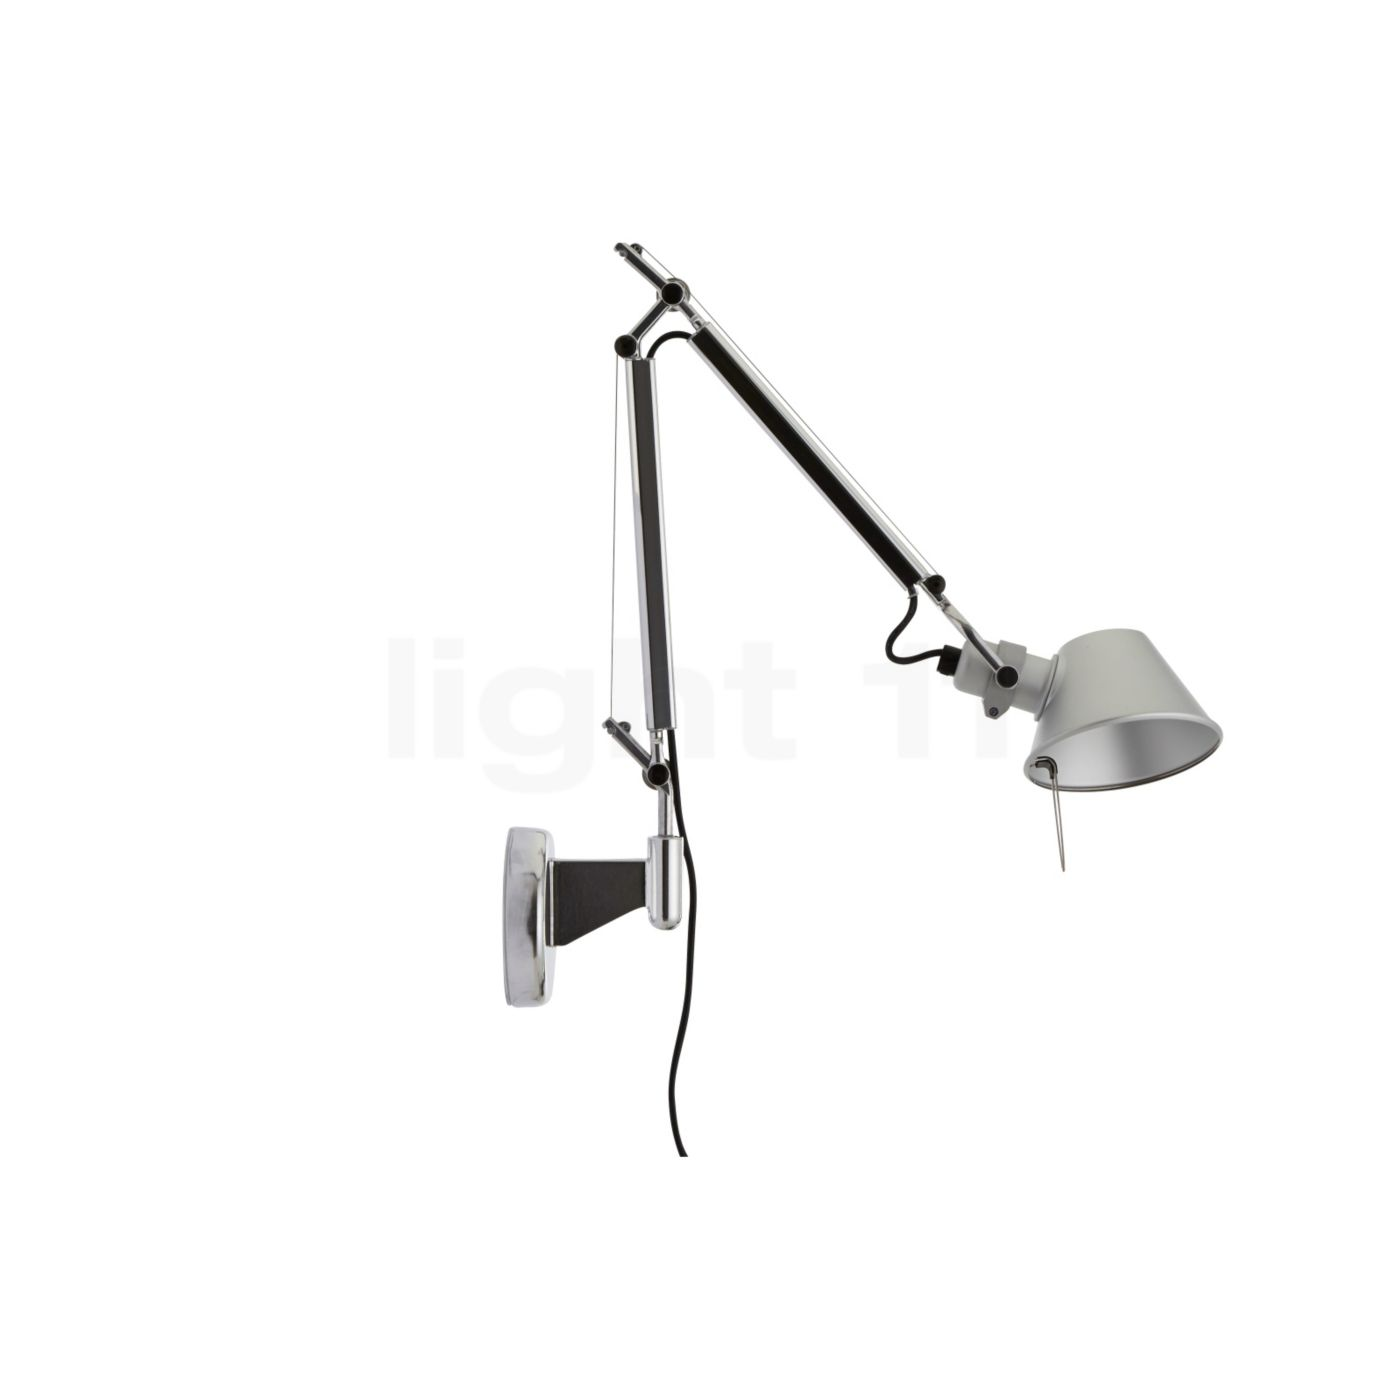 artemide tolomeo micro parete led reading lights -